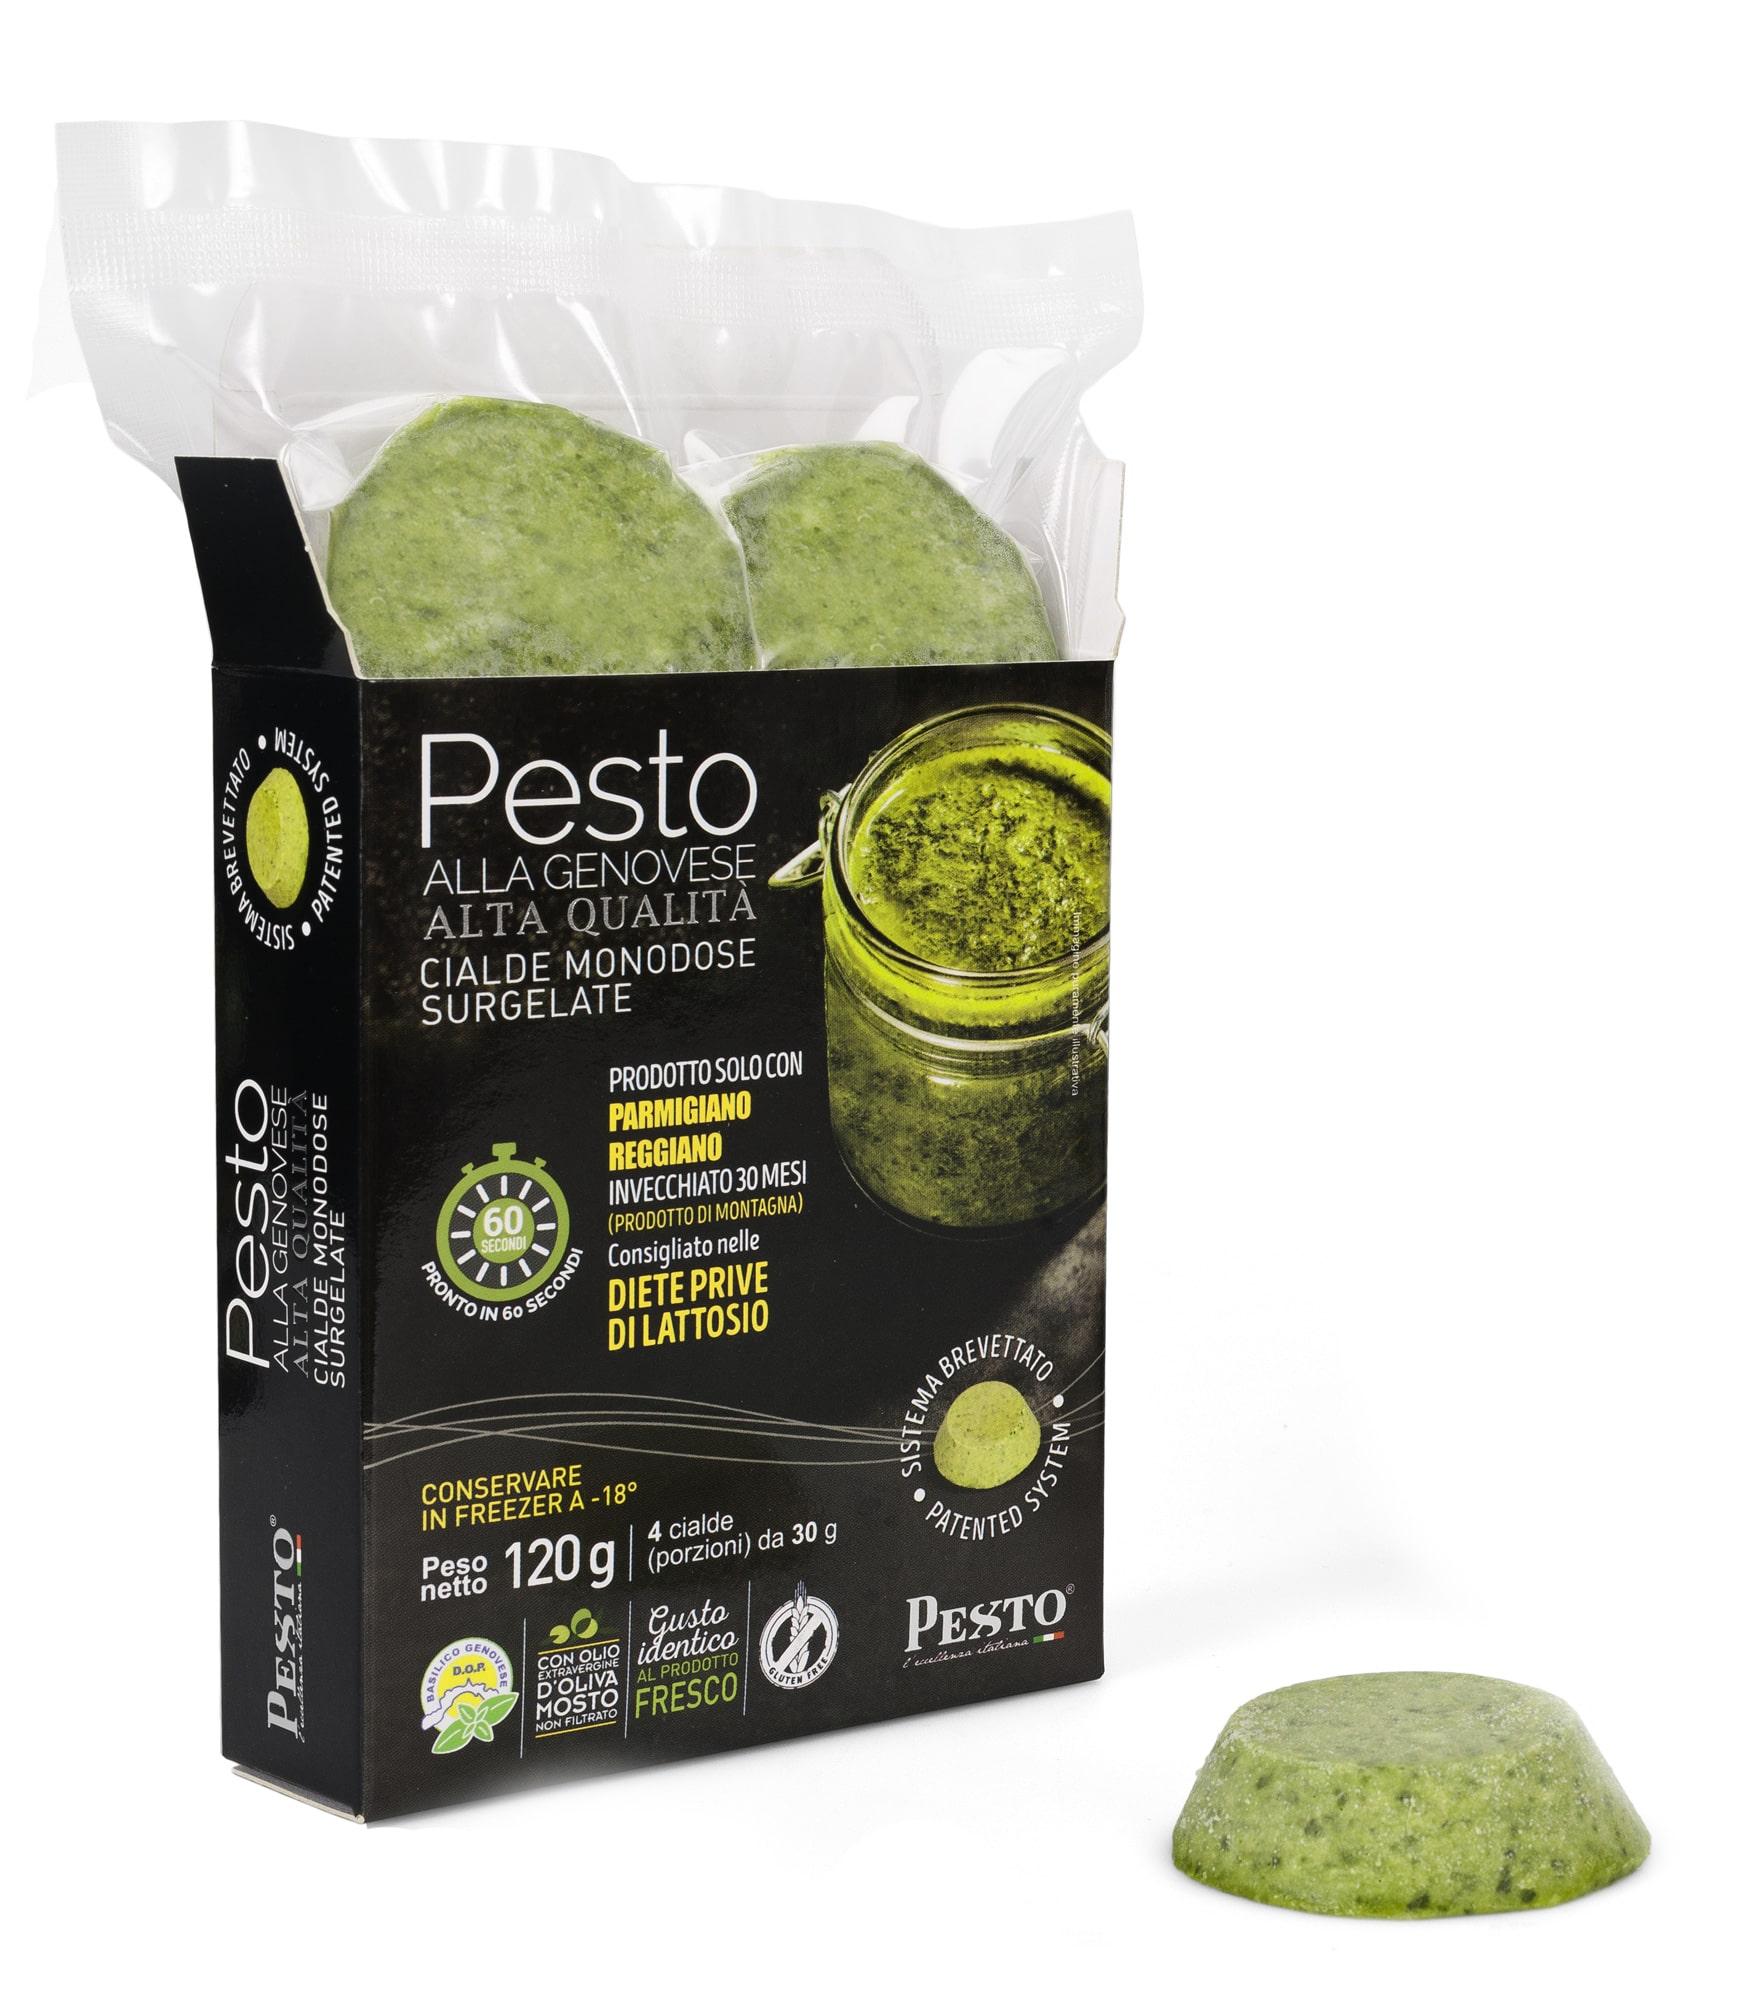 Pesto alla genovese Surgelato in Cialde monodose 120 gr